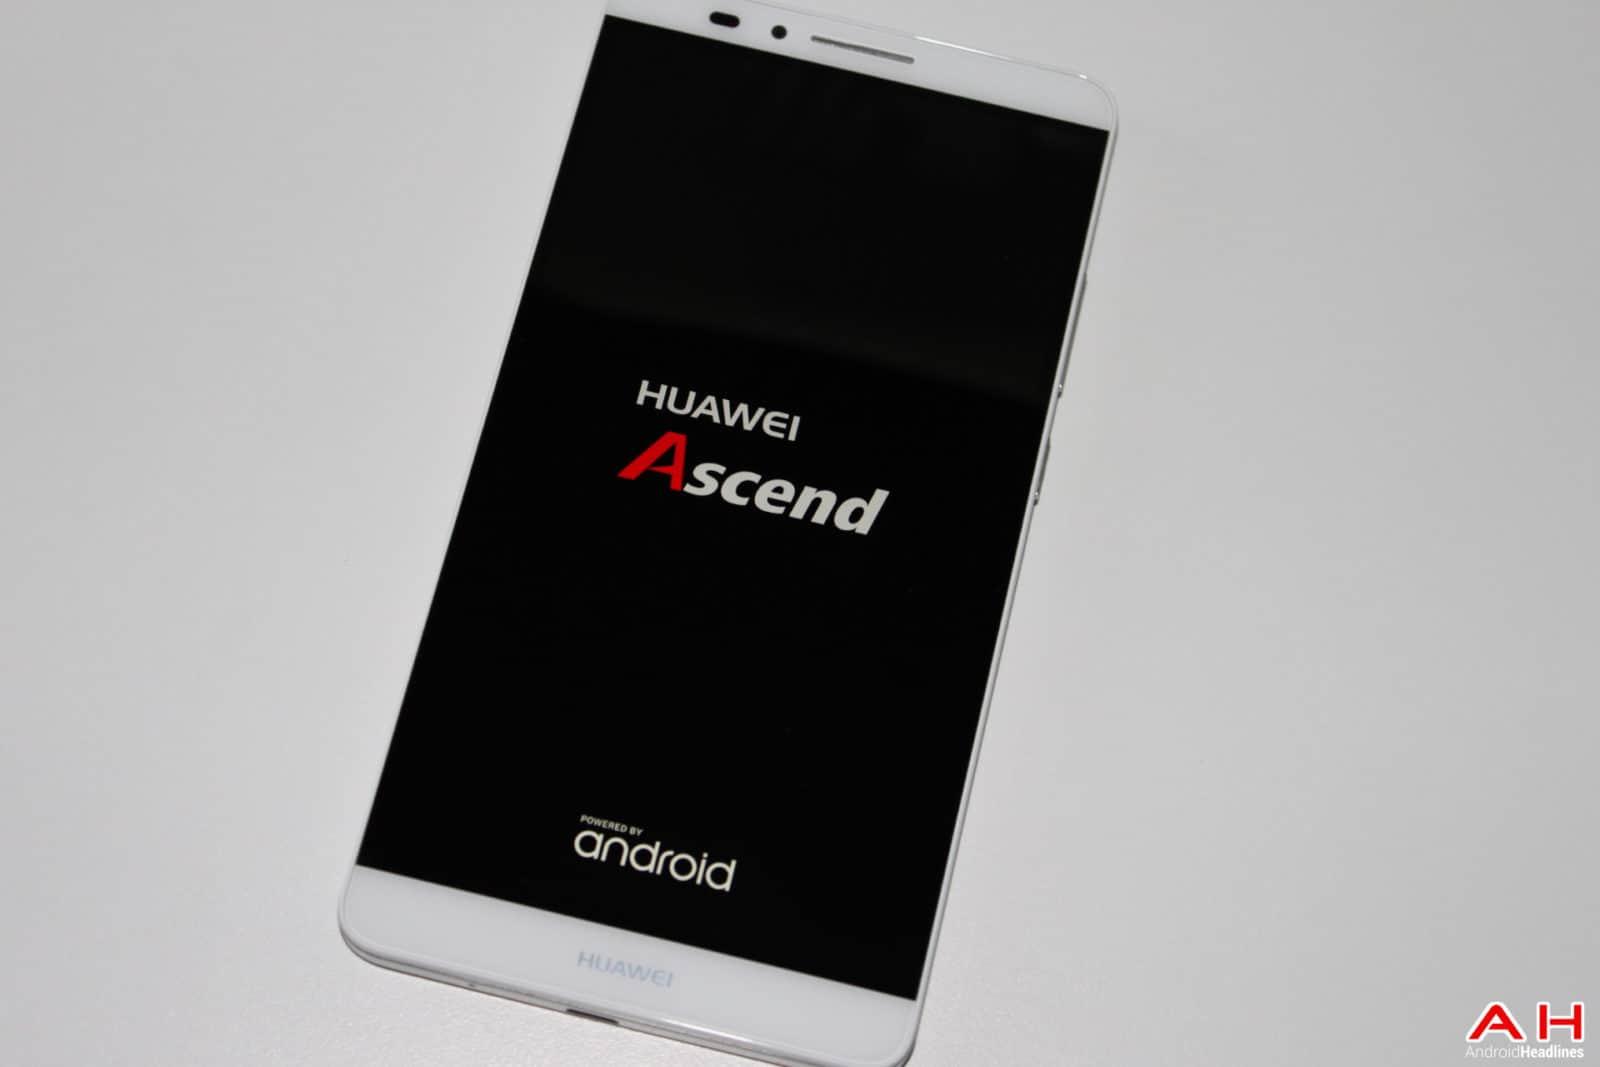 AH Huawei Logo Android Mate 7-4